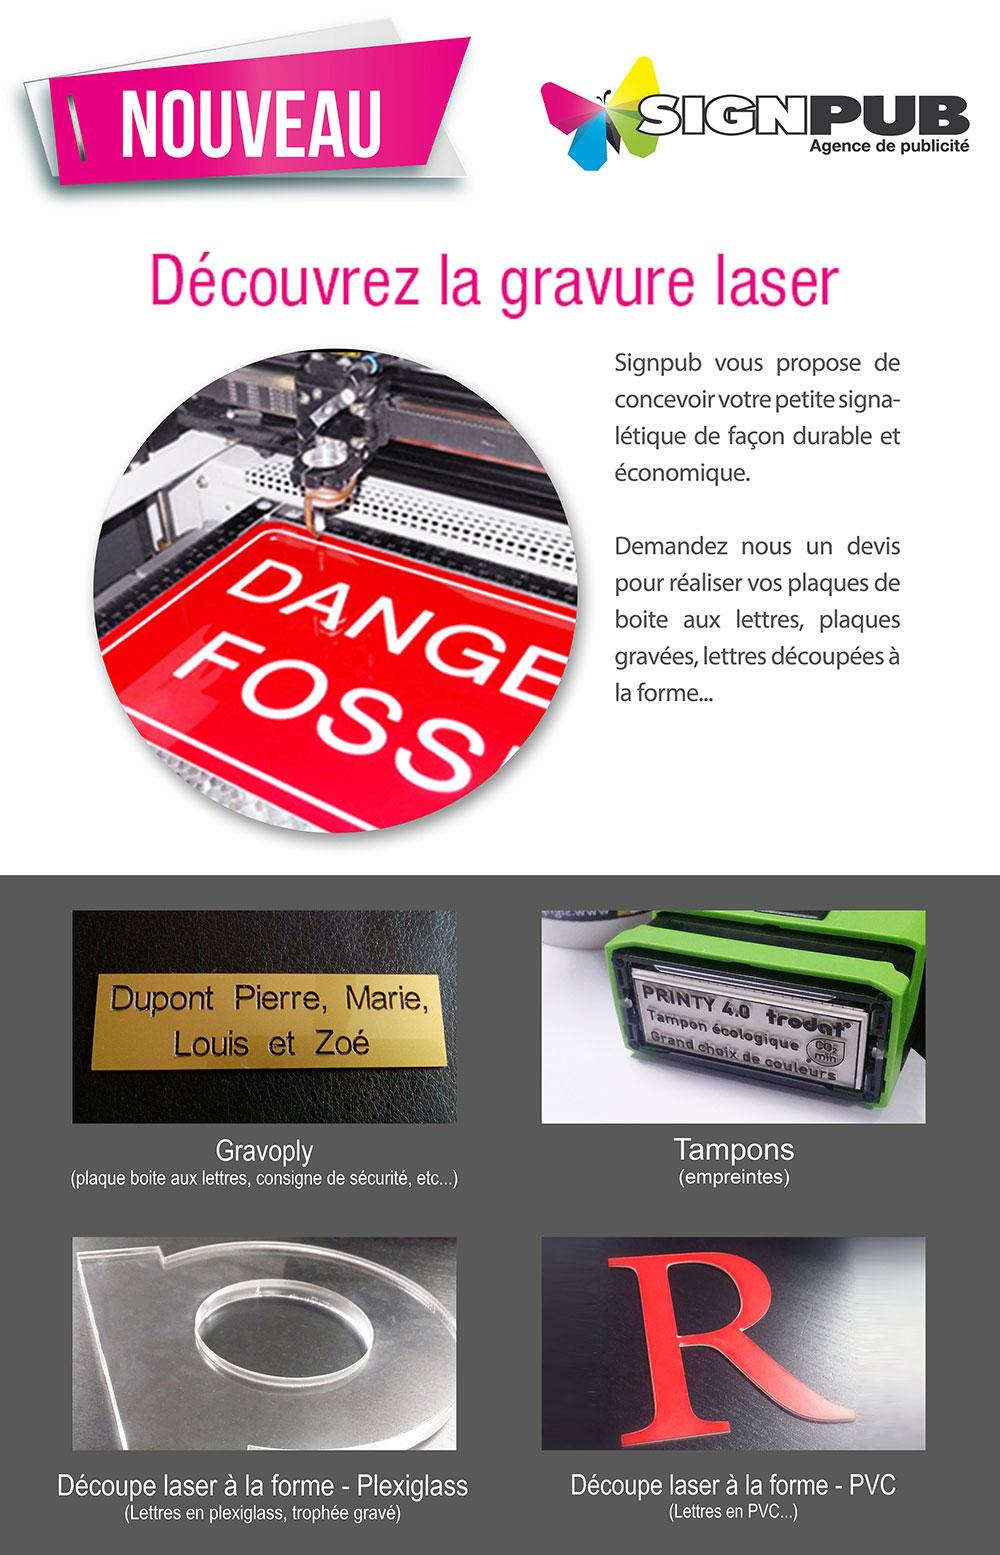 decoupe laser